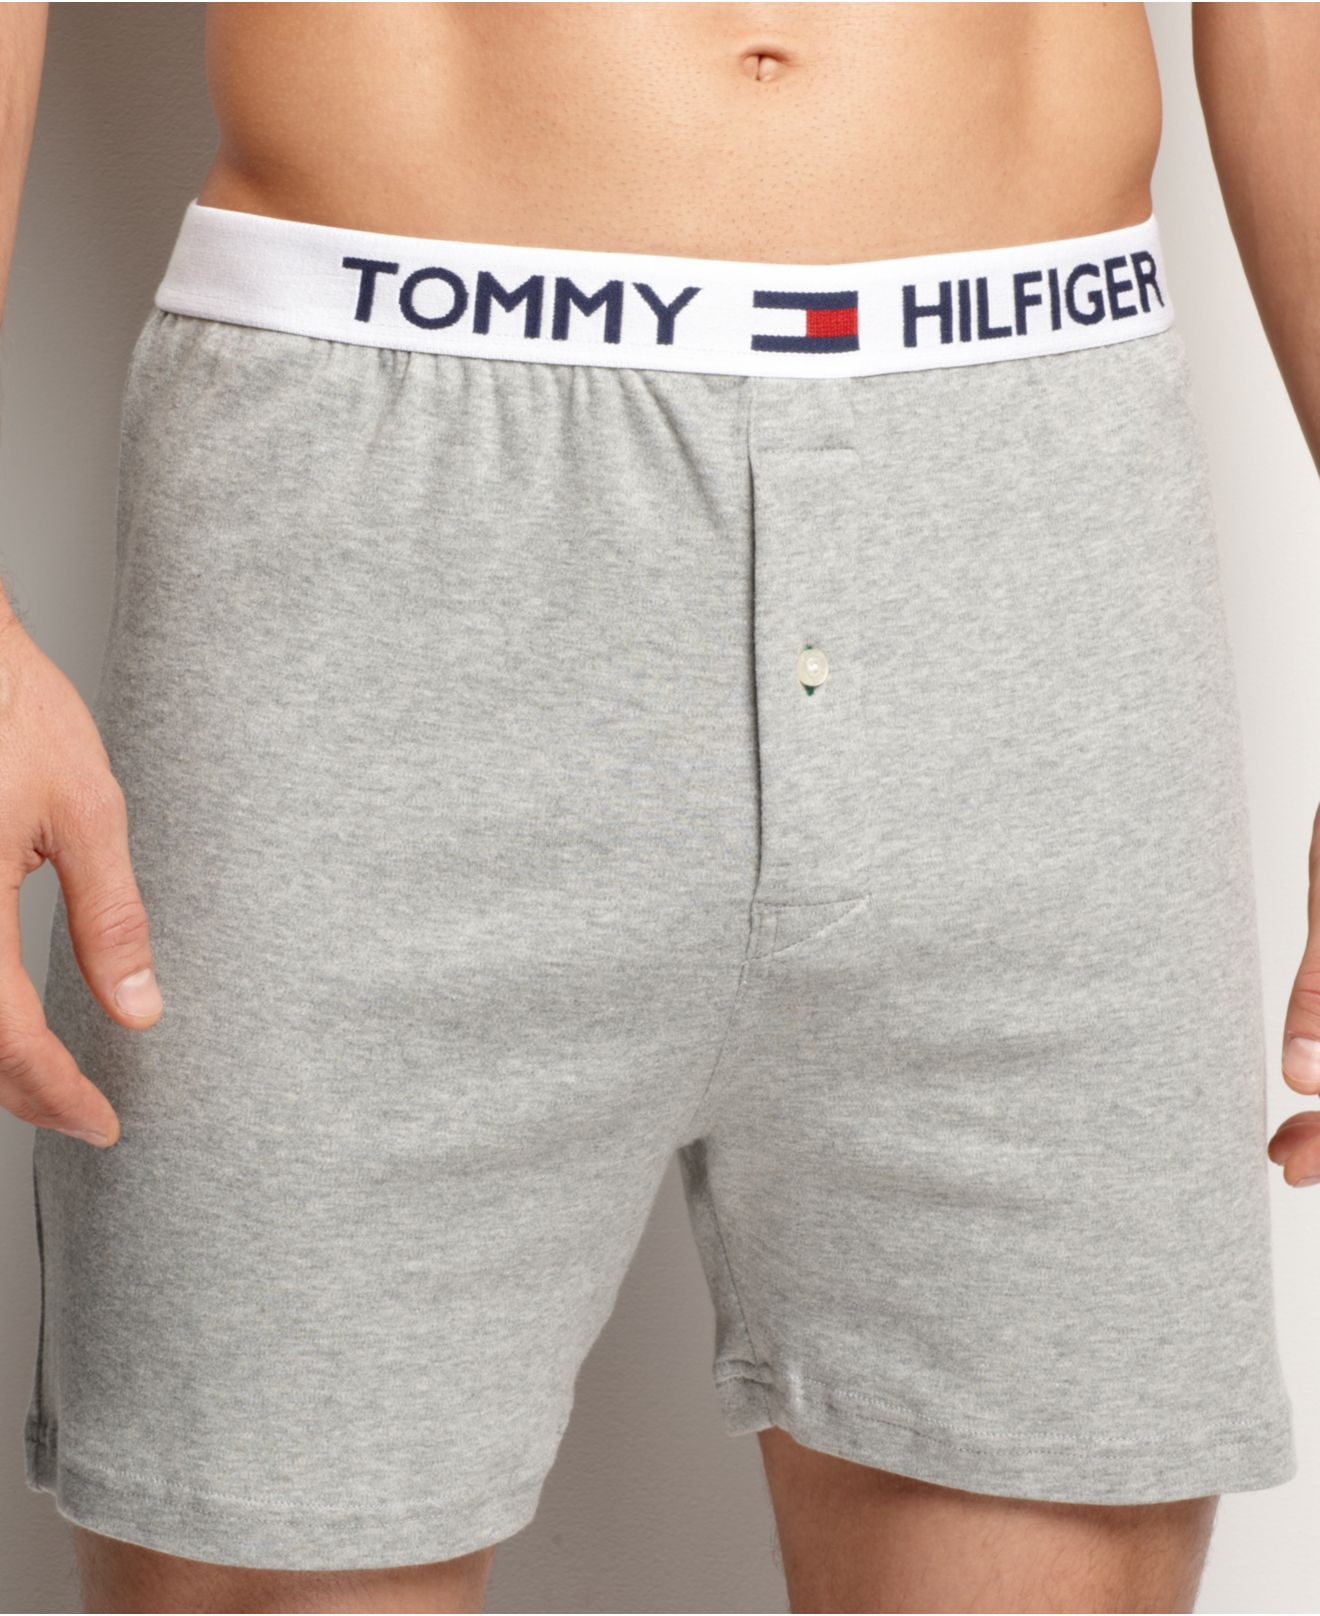 tommy hilfiger men 39 s underwear athletic knit boxer in gray for men grey heather save 25 lyst. Black Bedroom Furniture Sets. Home Design Ideas